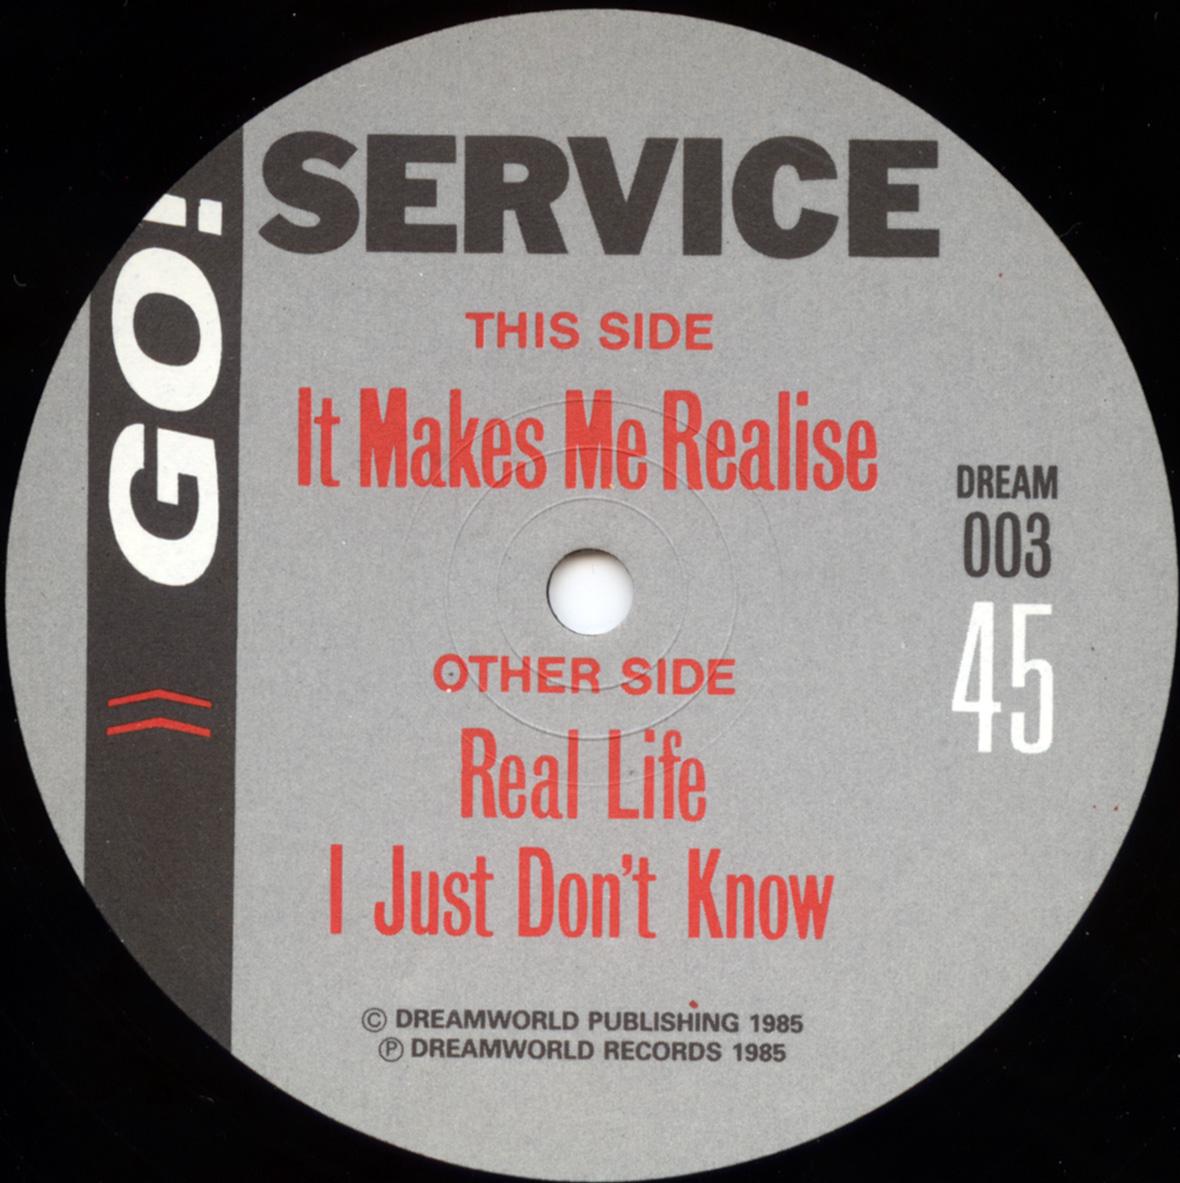 go service aside